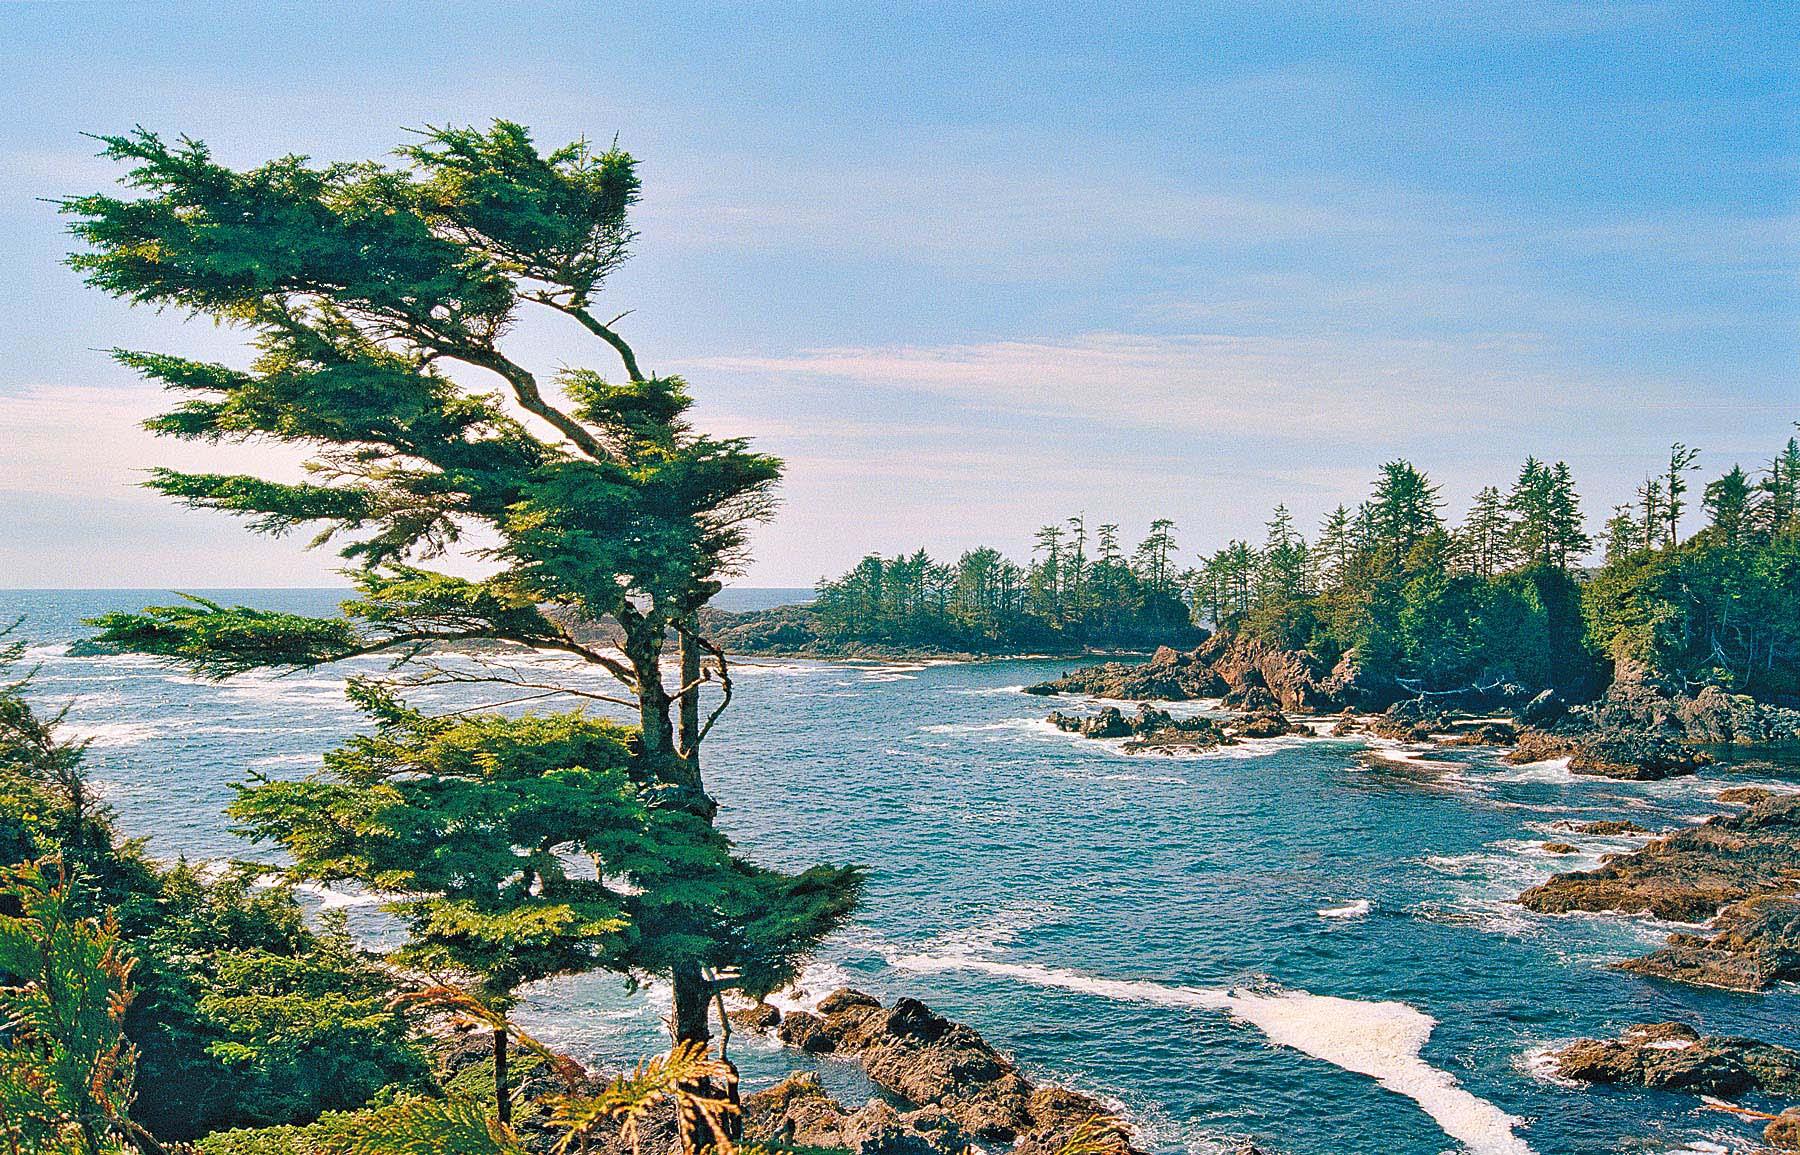 Wild Pacific Trail, Uclulet, British Columbia